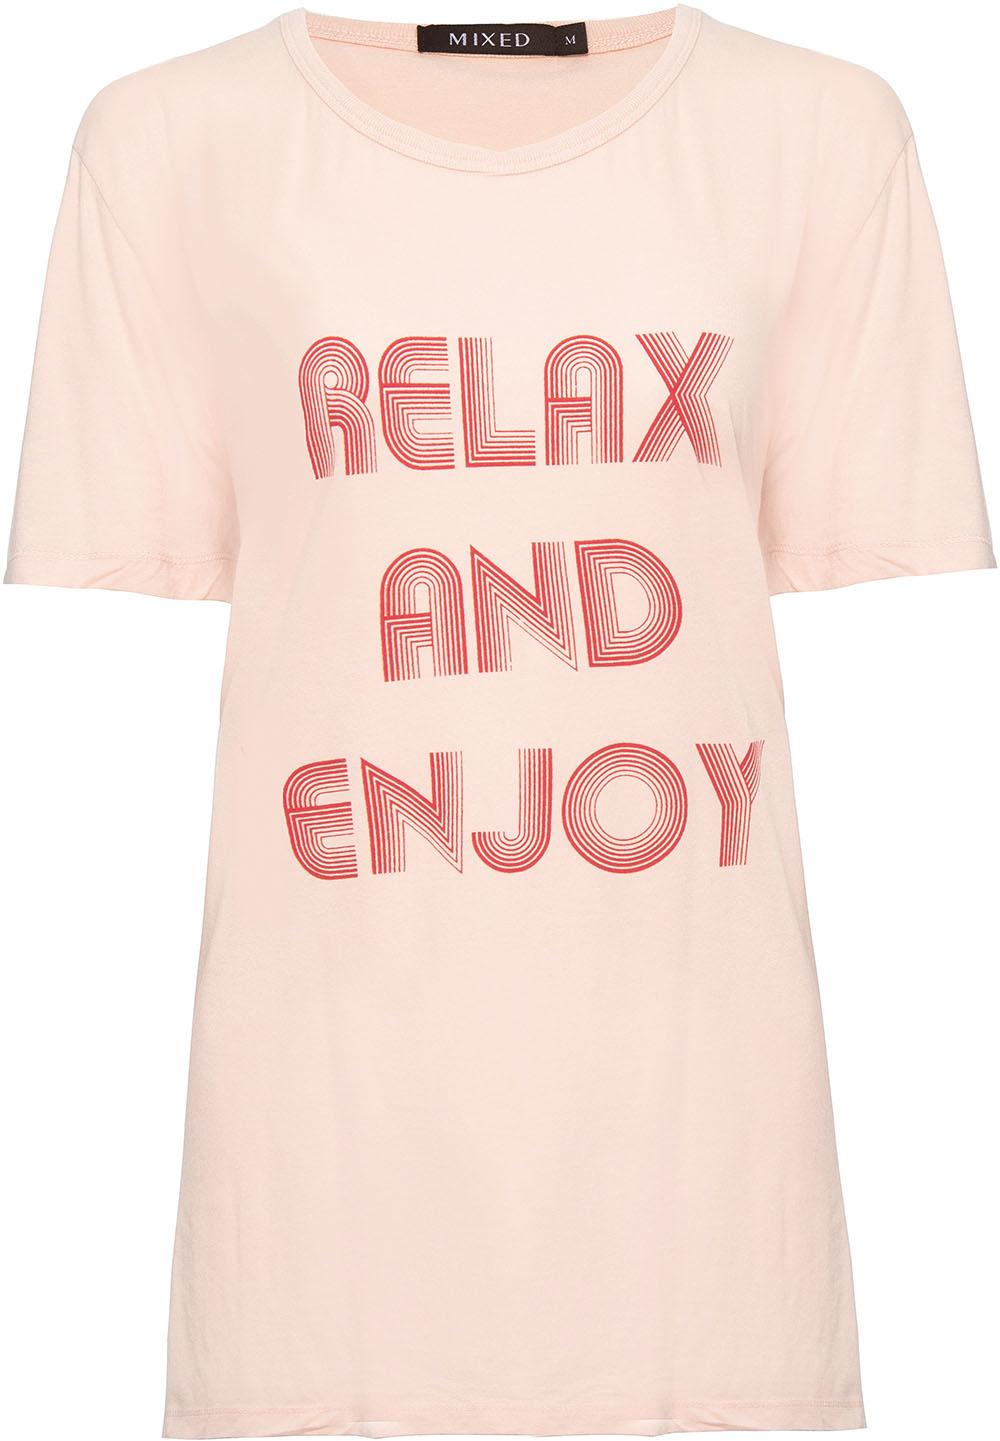 Camiseta Relax And Enjoy